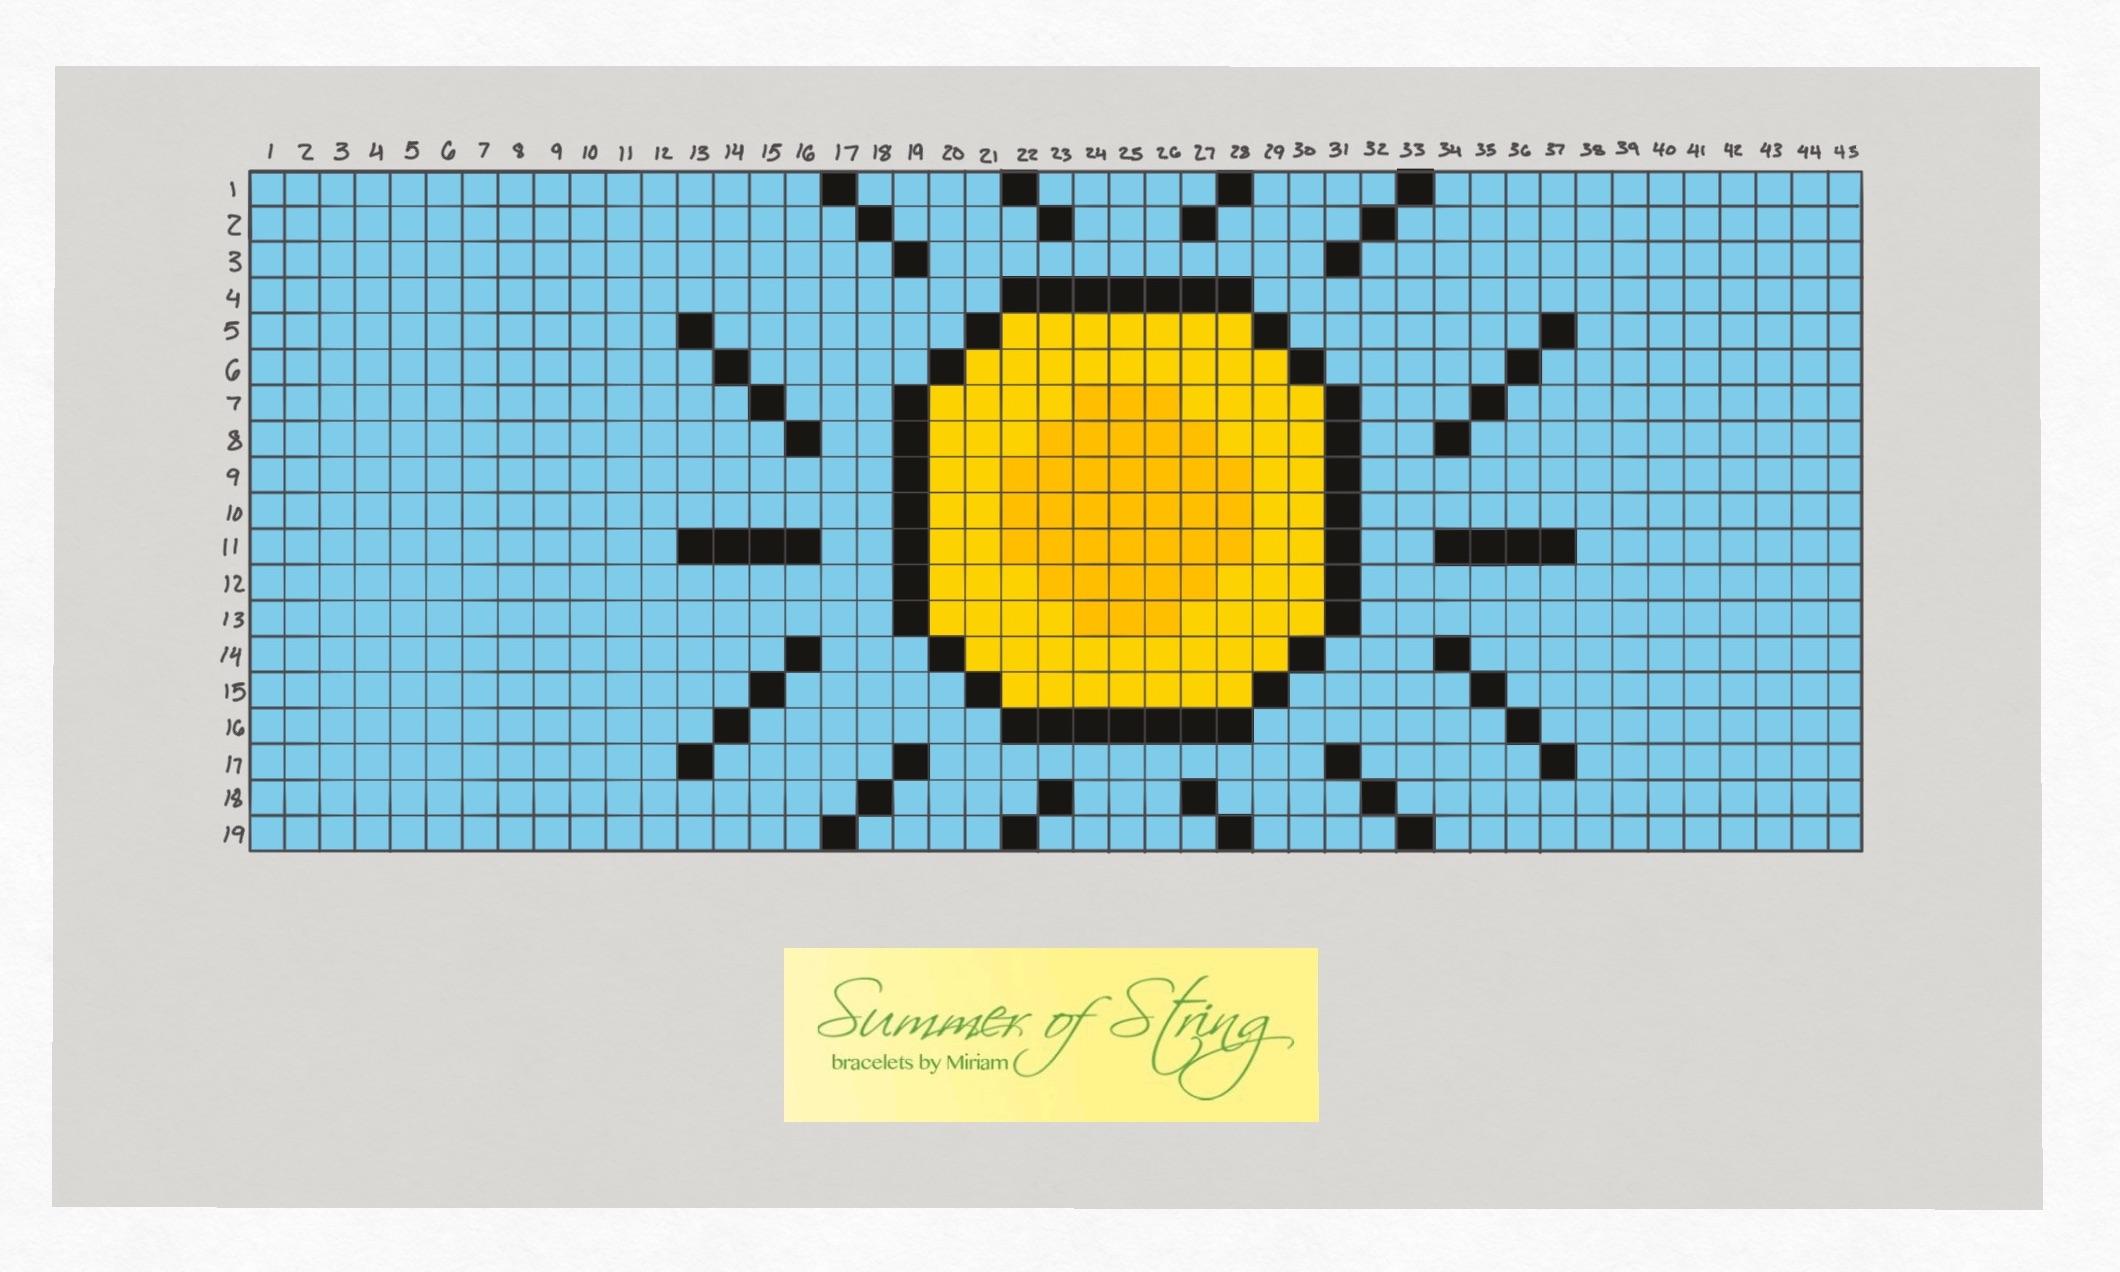 A Little Bit Of Sunshine Friendship Bracelet Pattern From Summer Of String Sartorial Geek